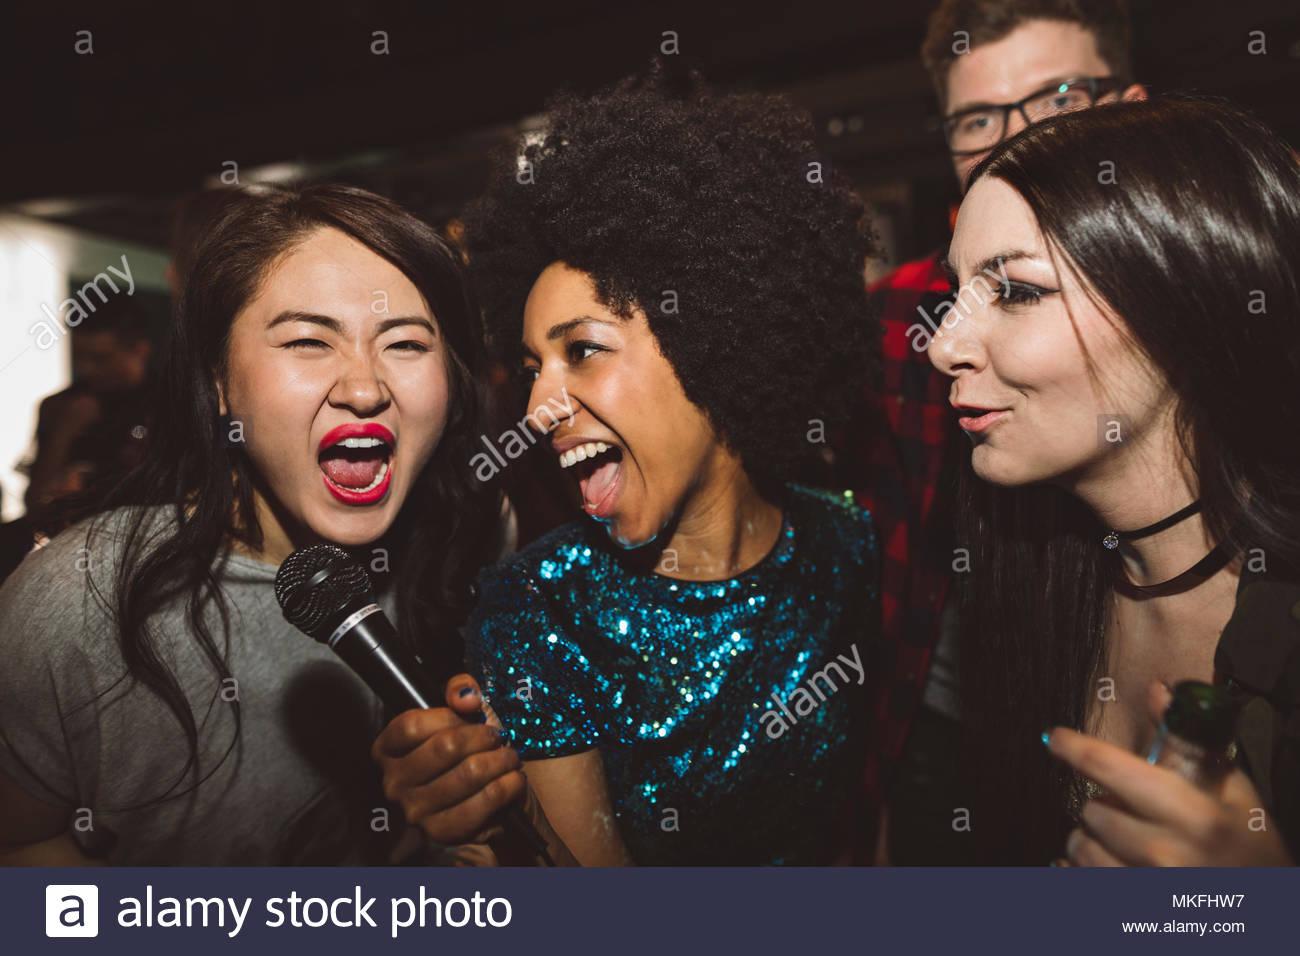 Espiègle, jeune femme exubérante amis millénaire singing karaoke Photo Stock